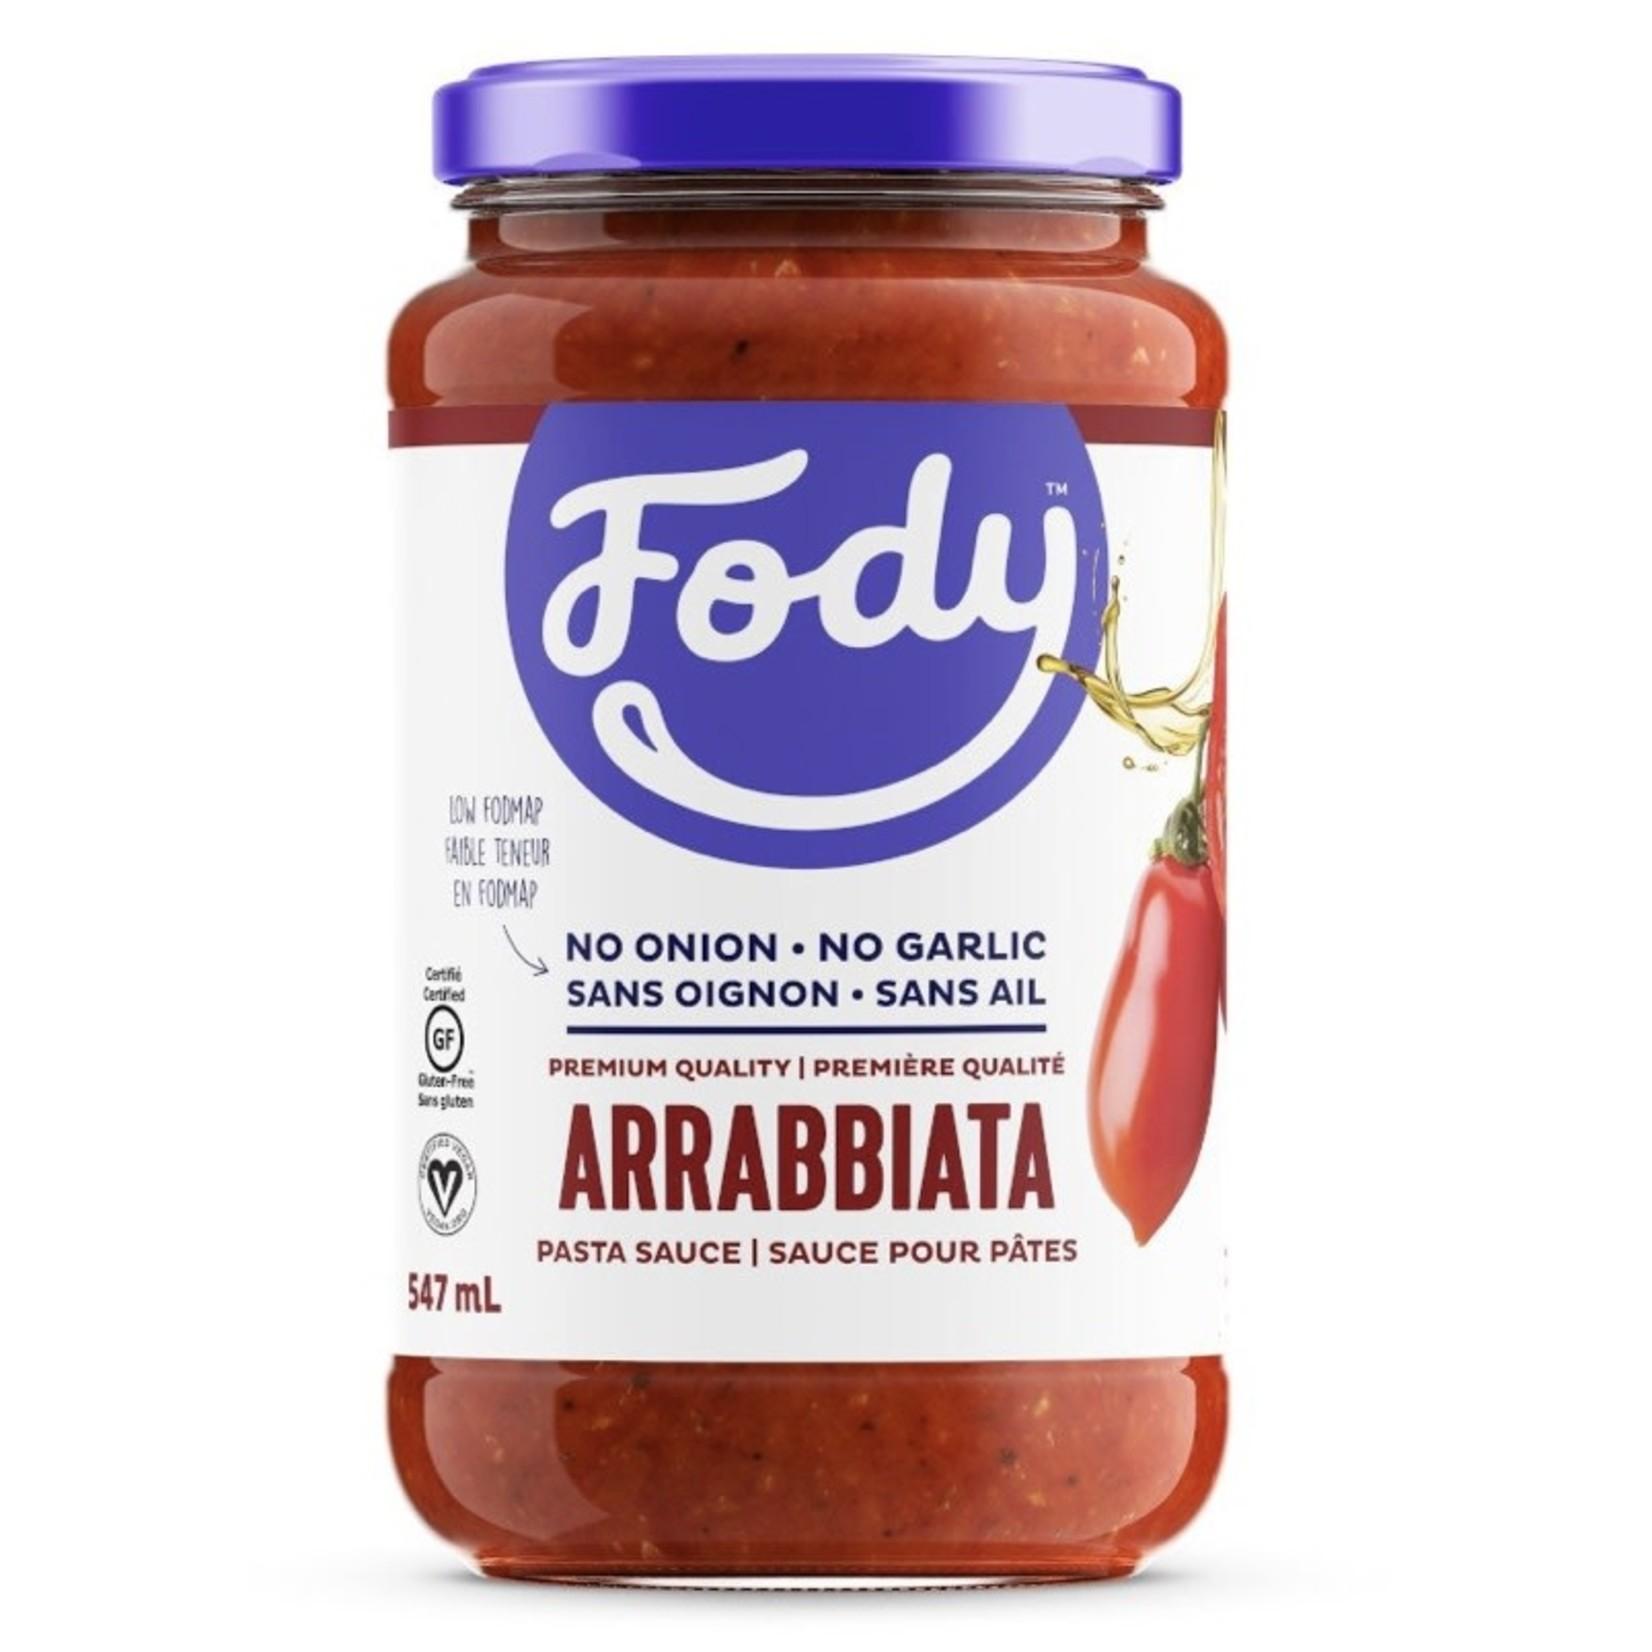 Fody Food Co. Fody Arrabbiata Sauce